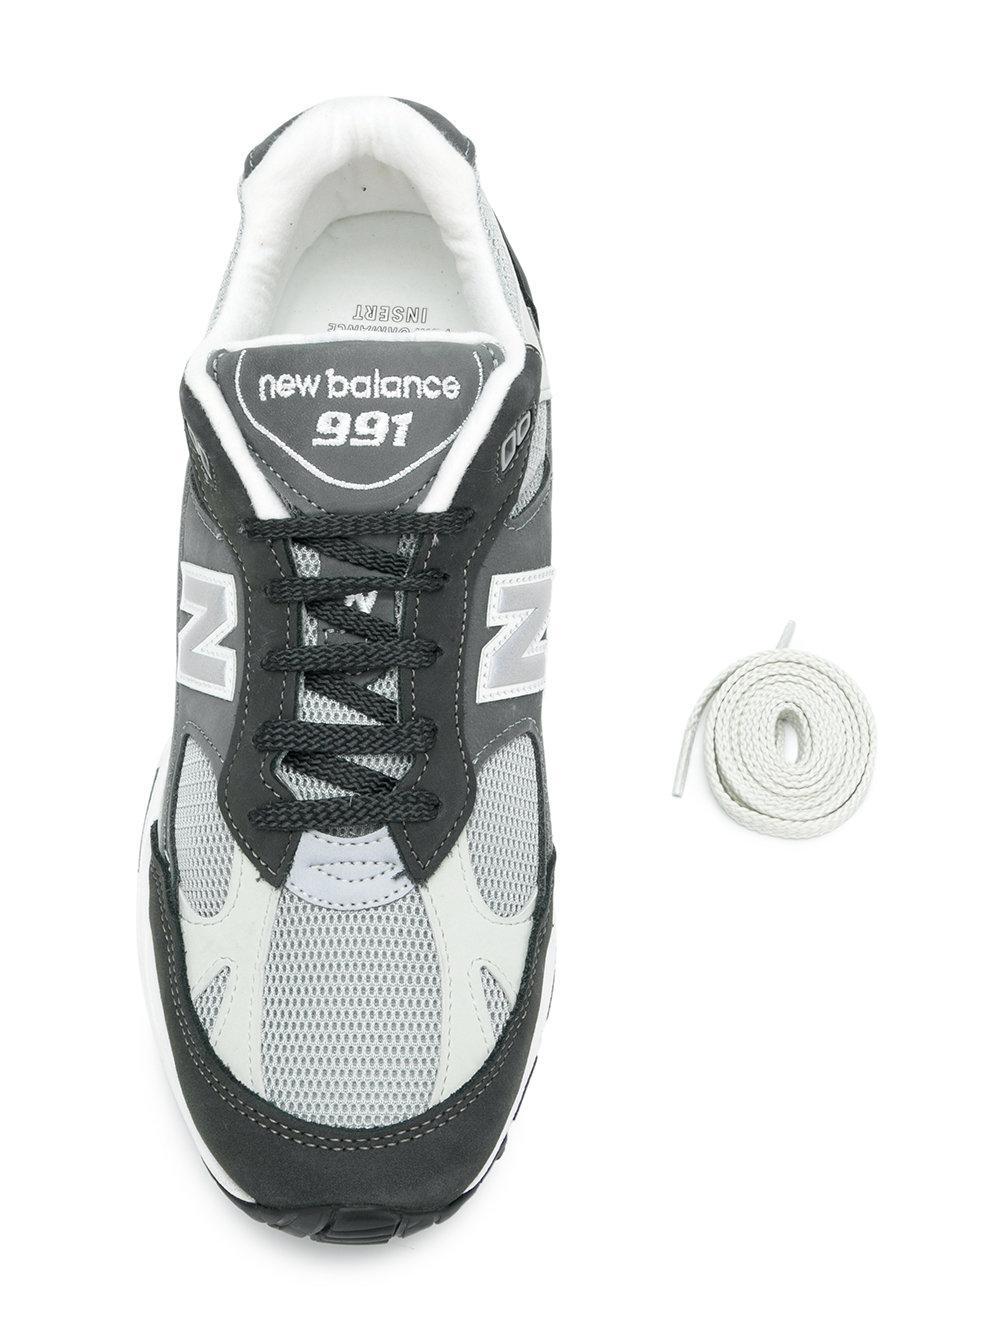 best mizuno shoes for walking exercise leslie nash